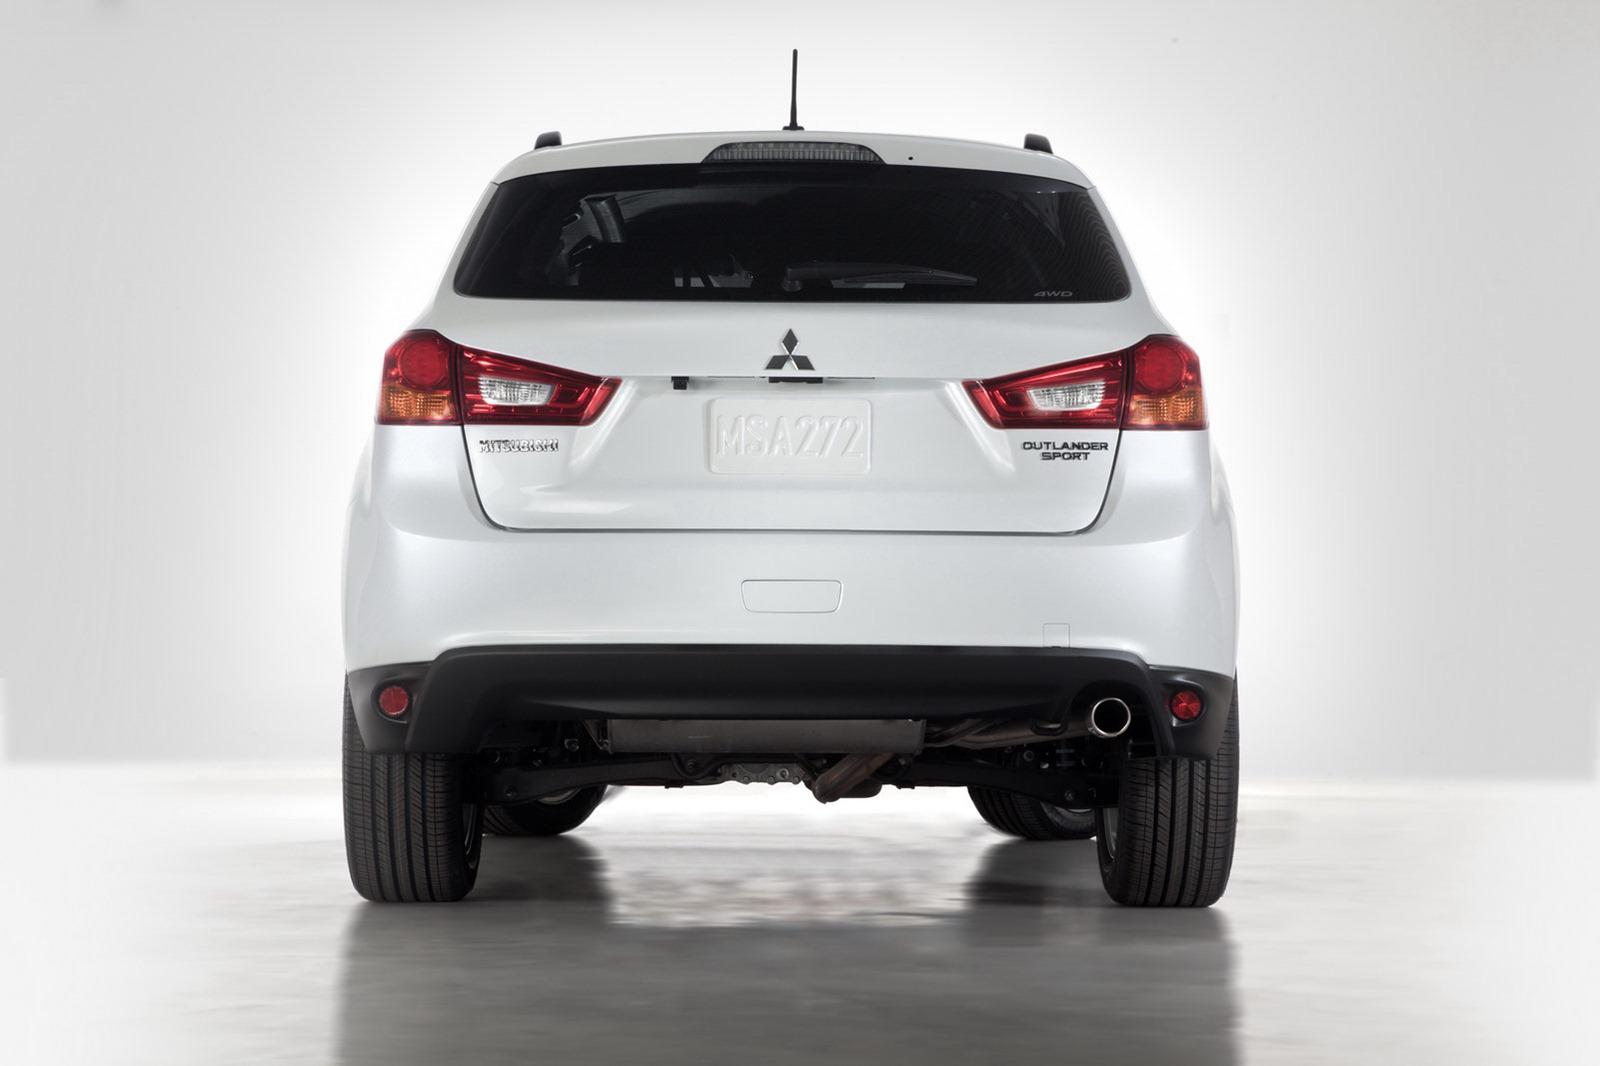 2013-Mitsubishi-Outlander-Sport-6[2].jpg